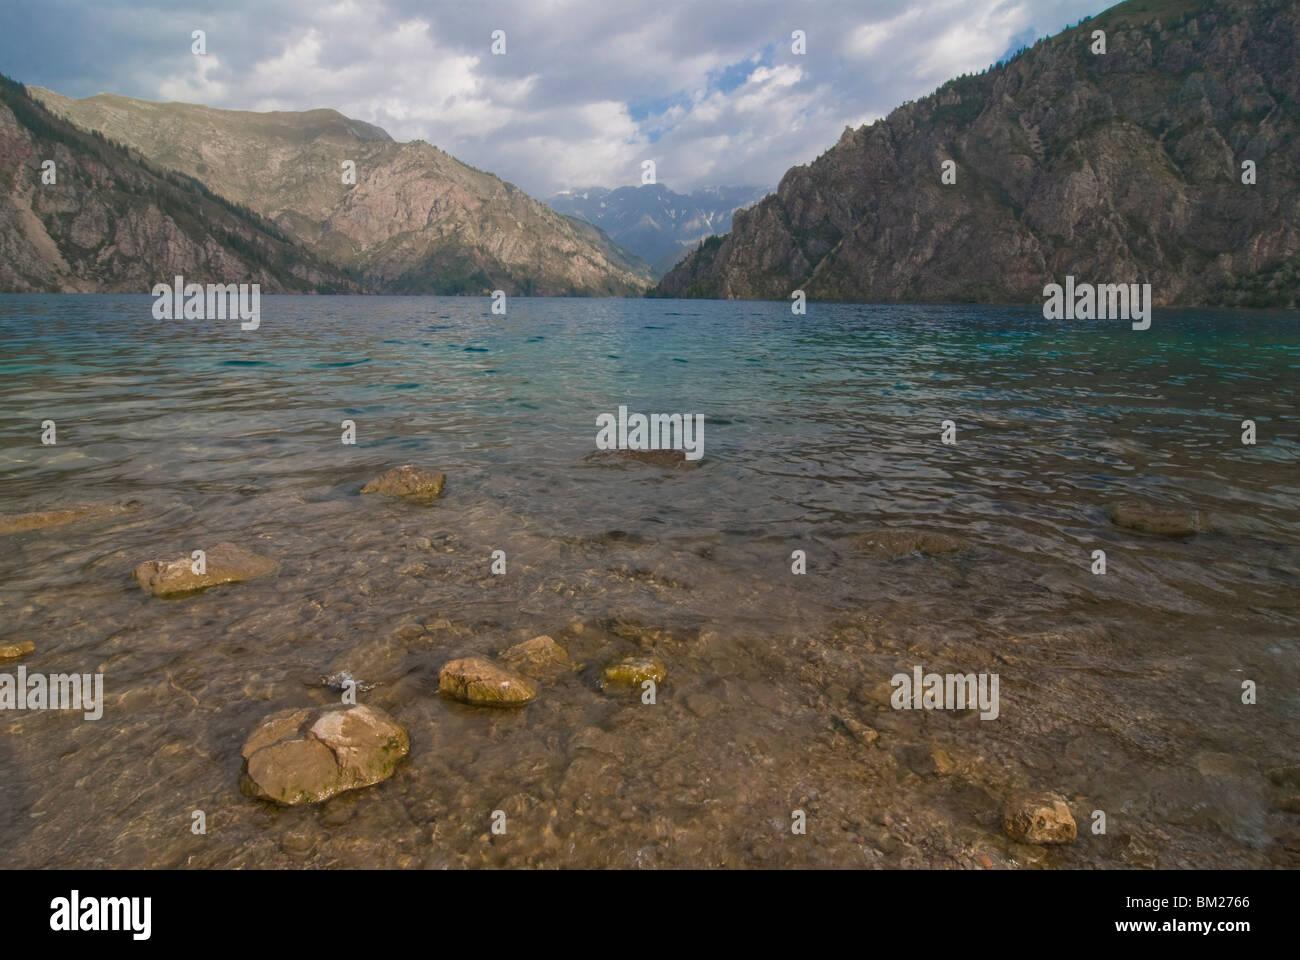 Sary-Chelek UNESCO Biosphere Reserve, Kirgisien, Zentralasien Stockbild